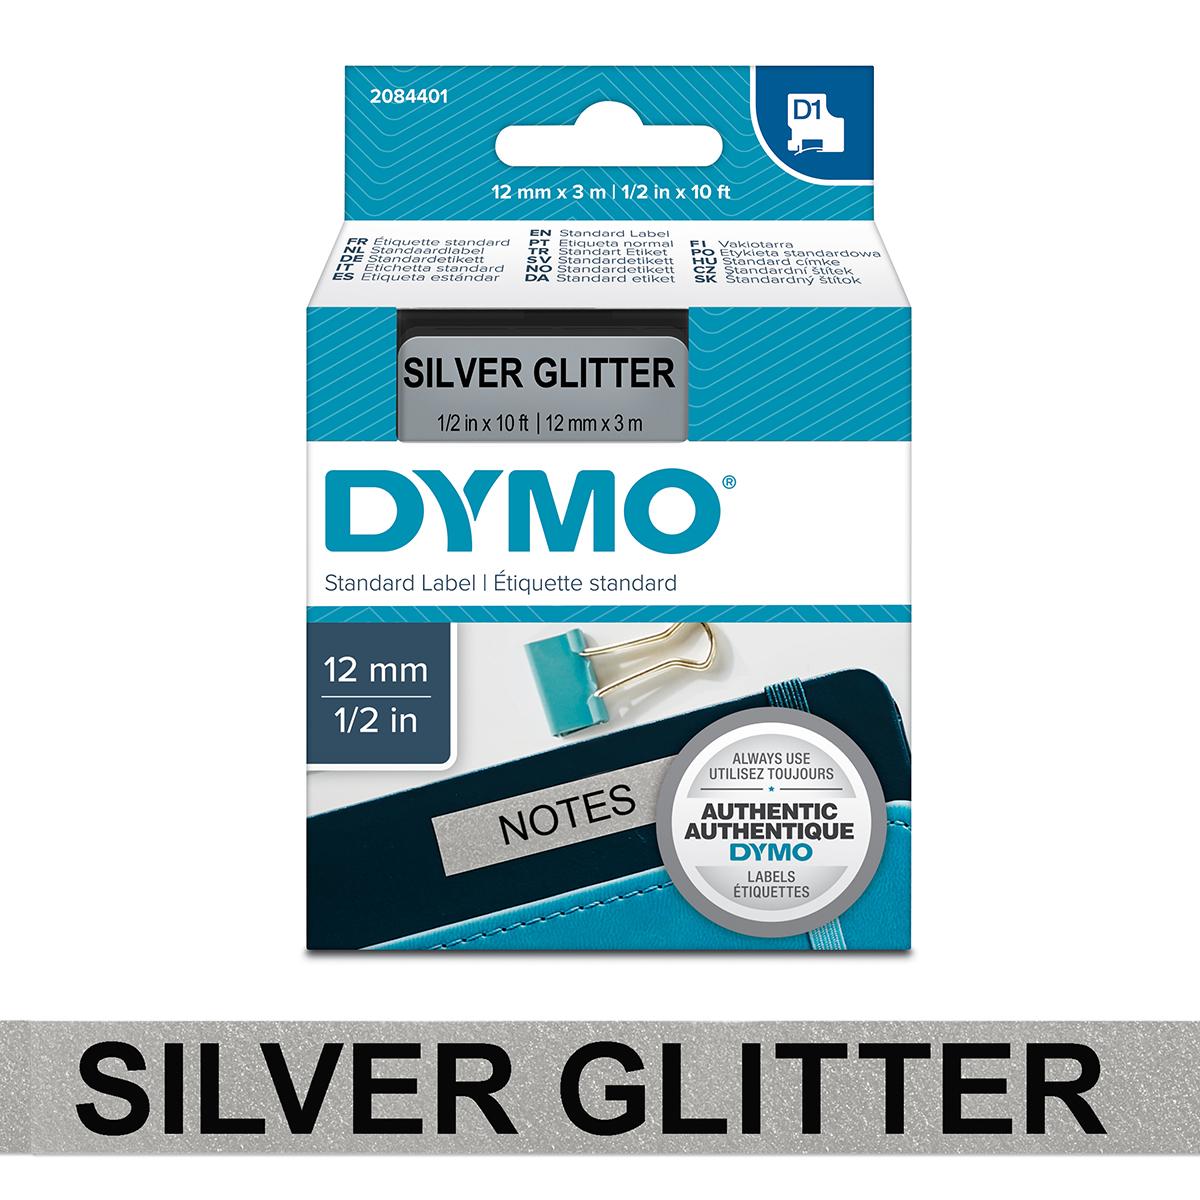 Dymo 2084401 D1 12mm x 3m Black on Silver Glitter Tape